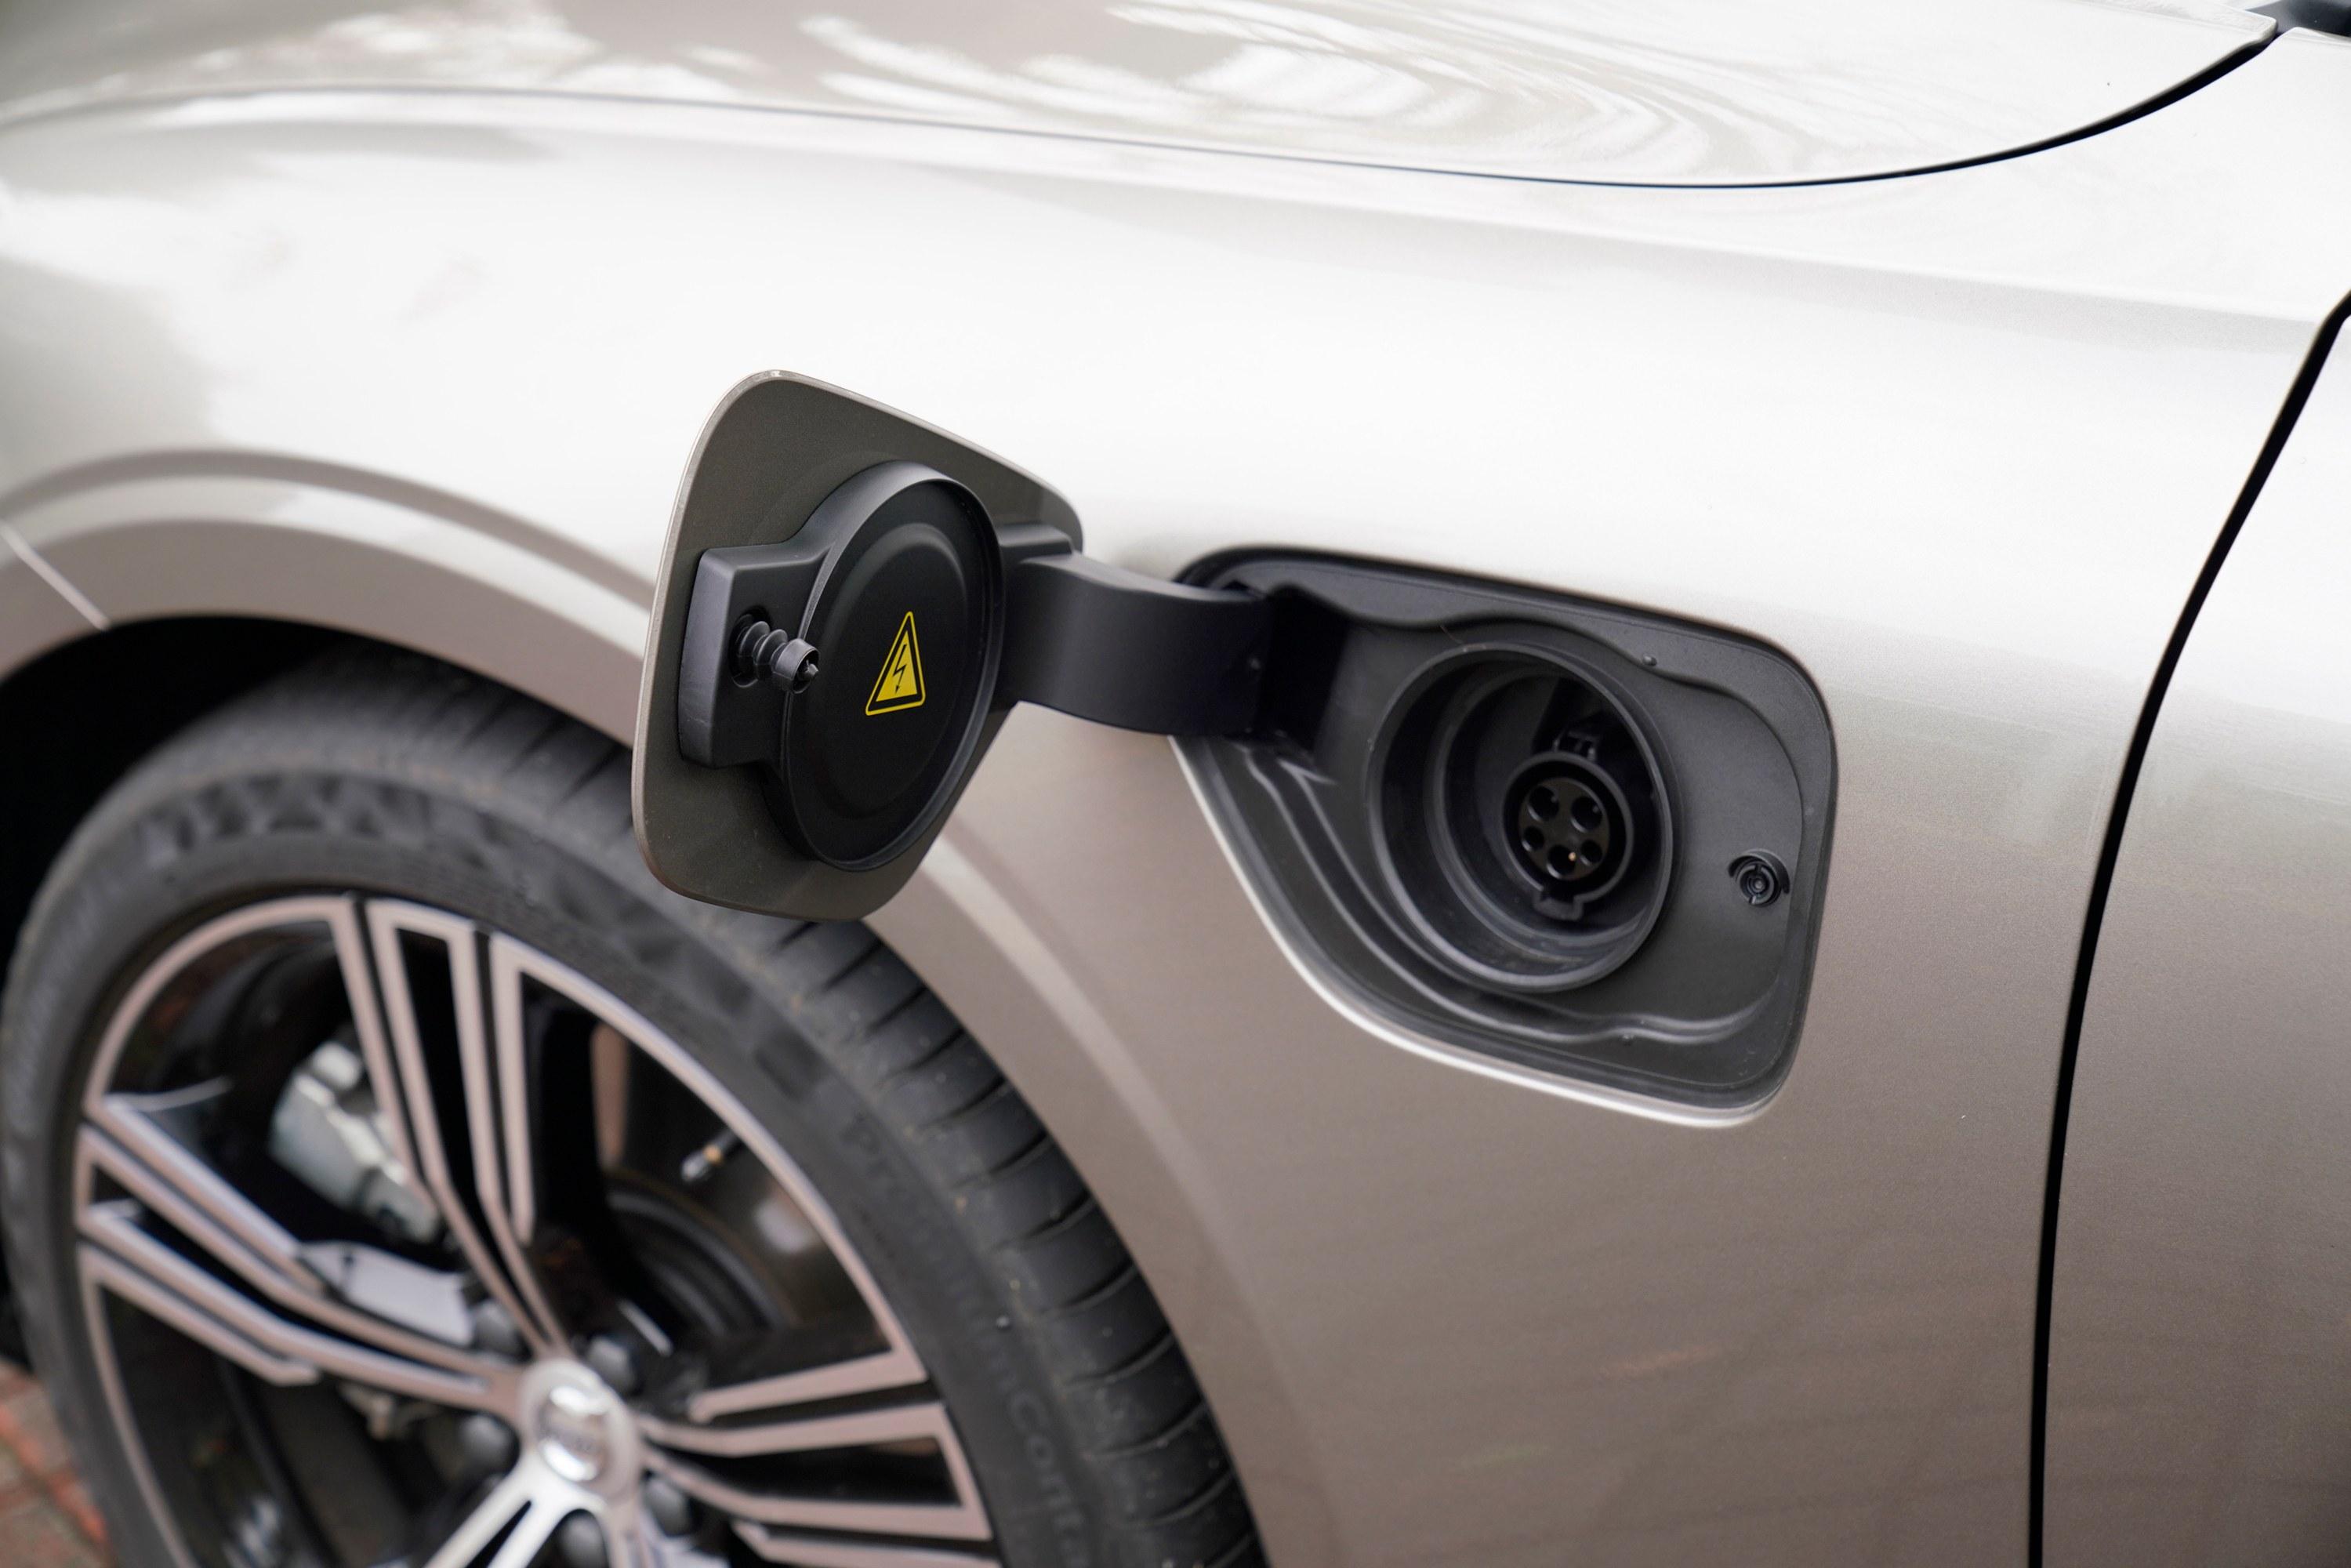 PHEVをそろそろ真剣に検討できる? 輸入車セダン市場に割って入るボルボ S60の魅力